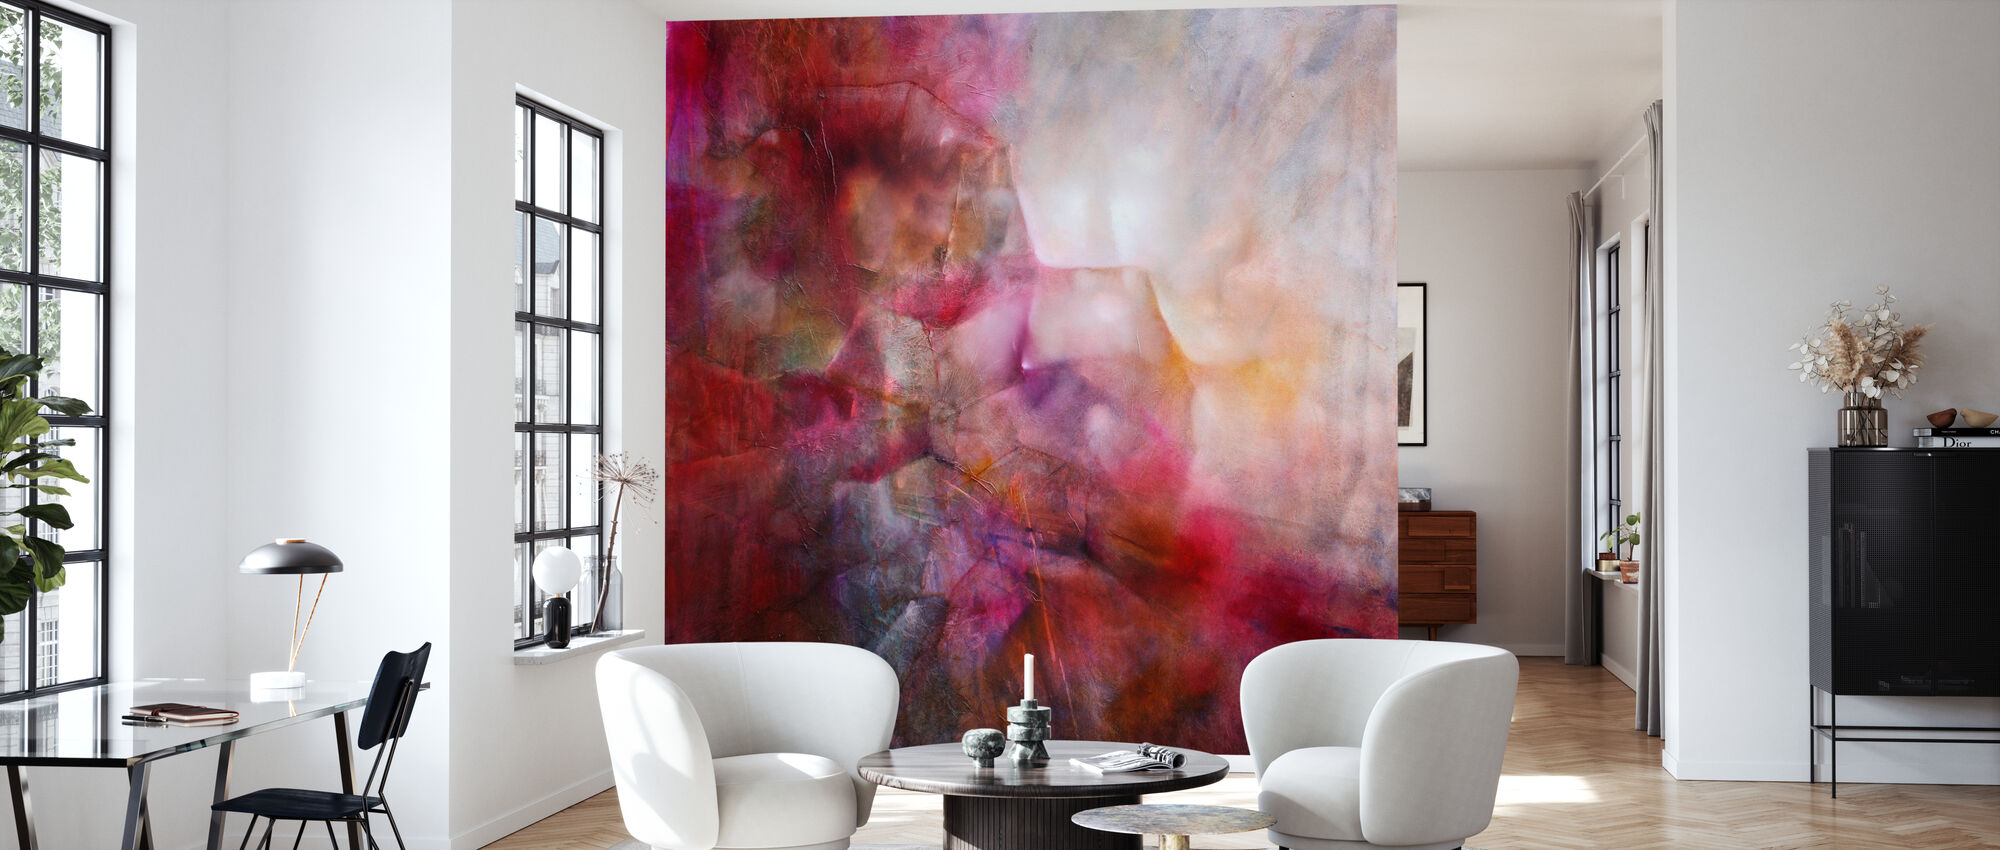 Inside Out - Wallpaper - Living Room